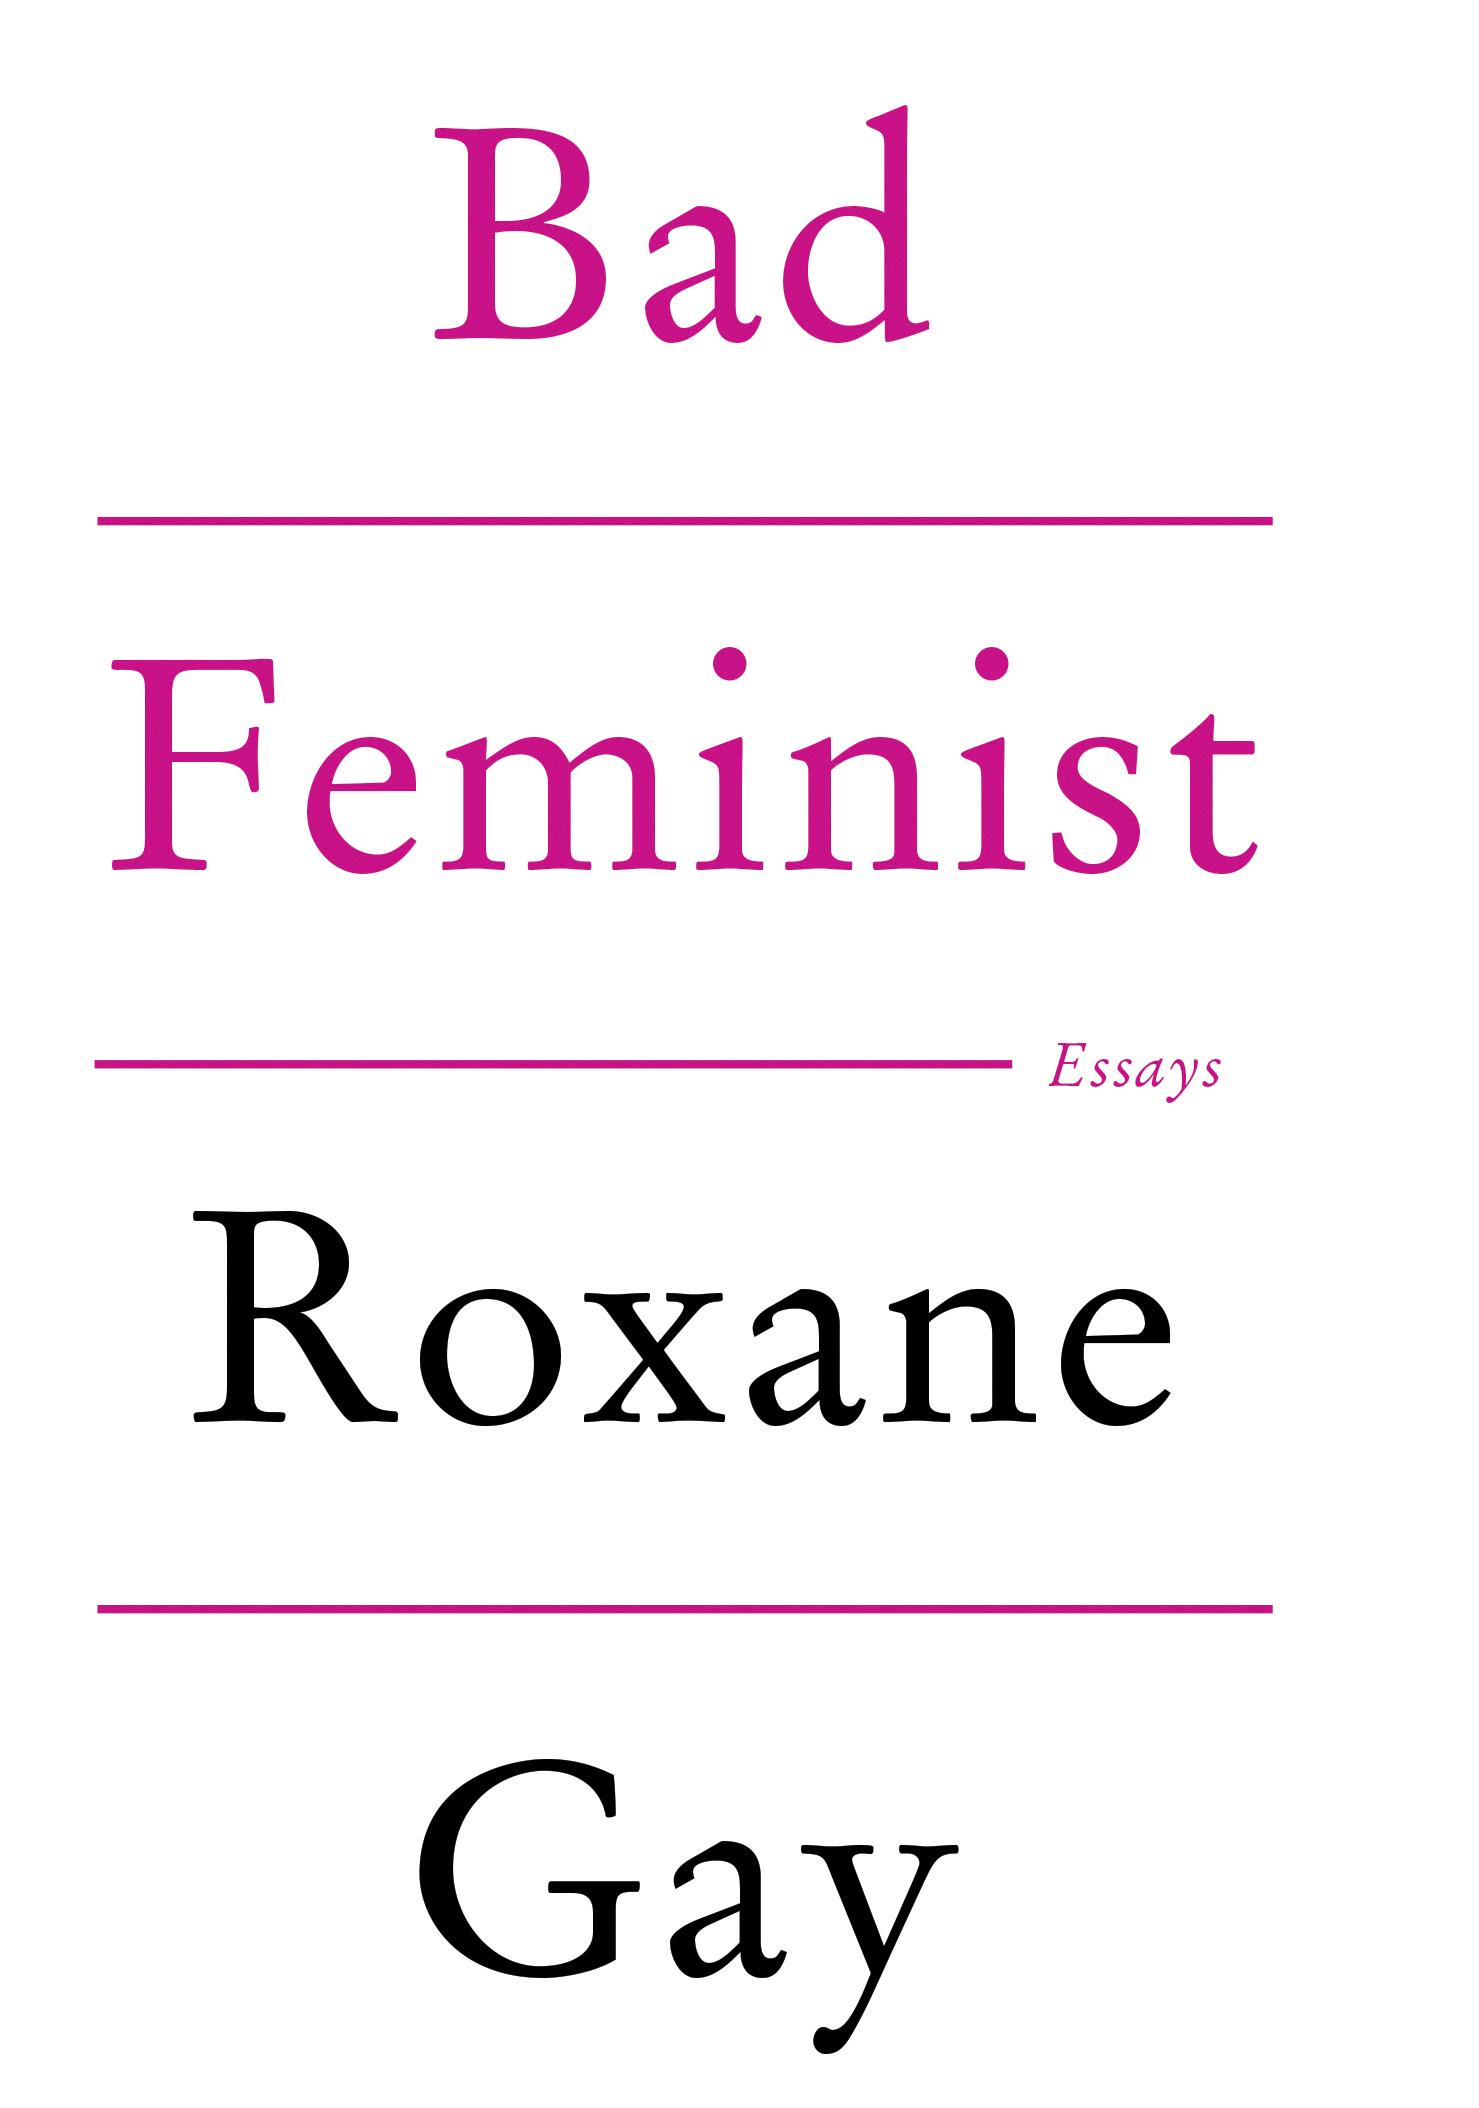 3. Livre - Bad Feminist - Roxane Gay (Trad. de l'anglais (États-Unis) par Santiago Artozqui)